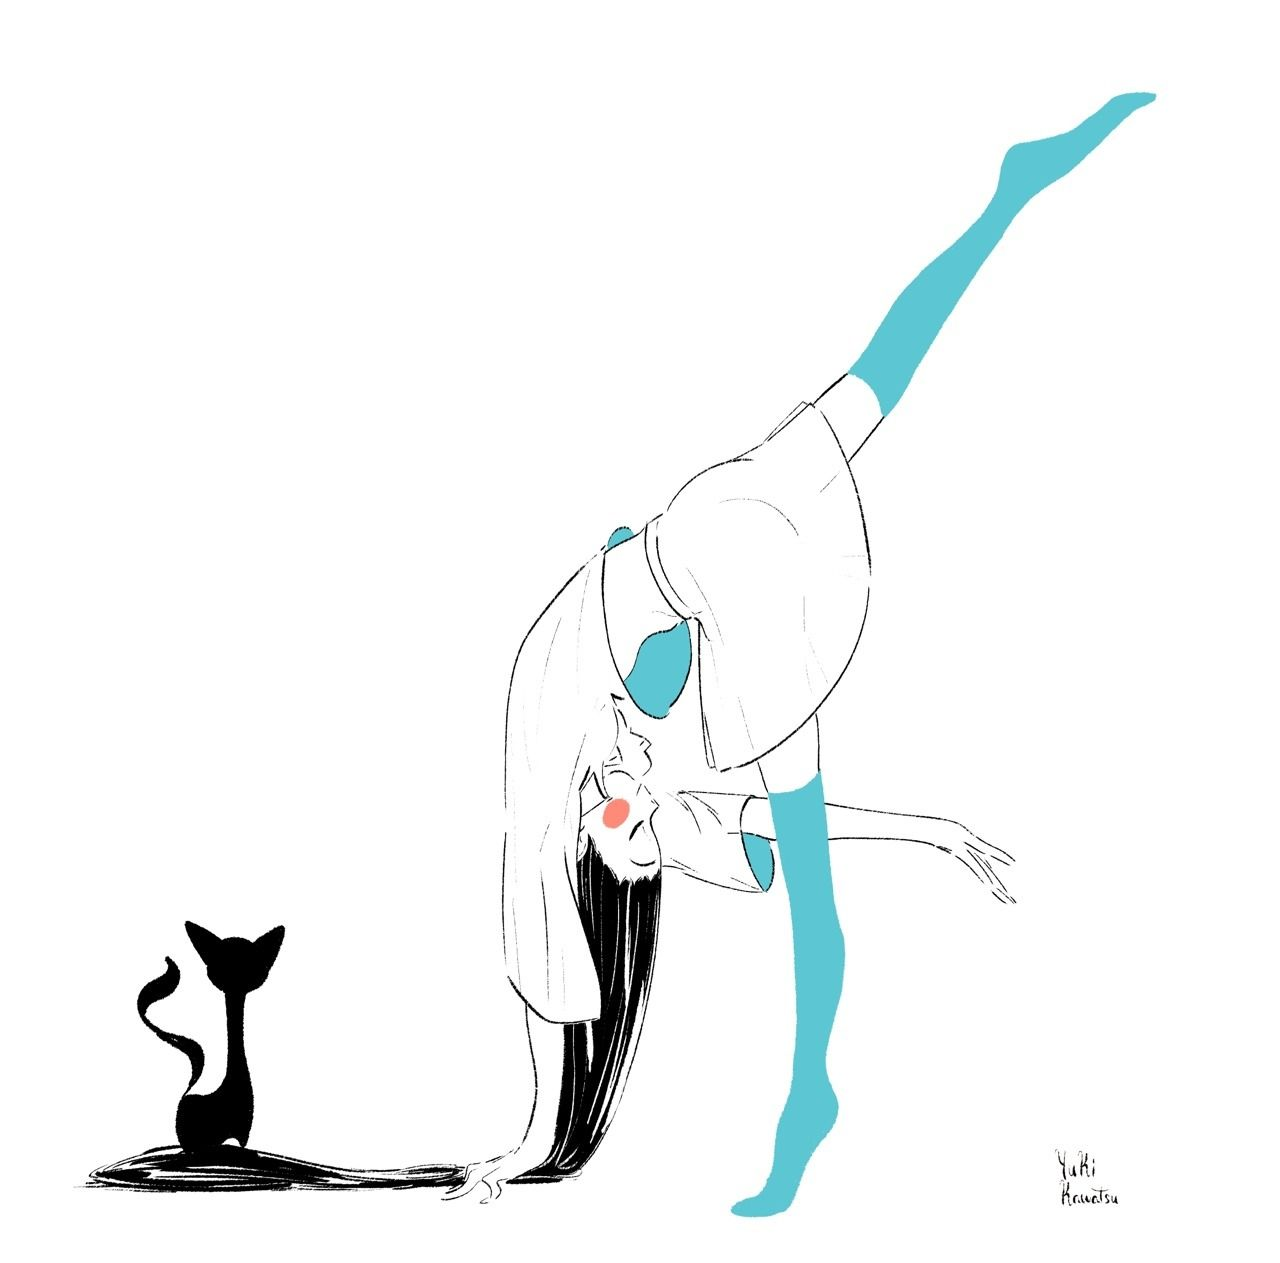 yuki kawatsu illustration アニメーションスケッチ キャラクターデザイン ダンス イラスト